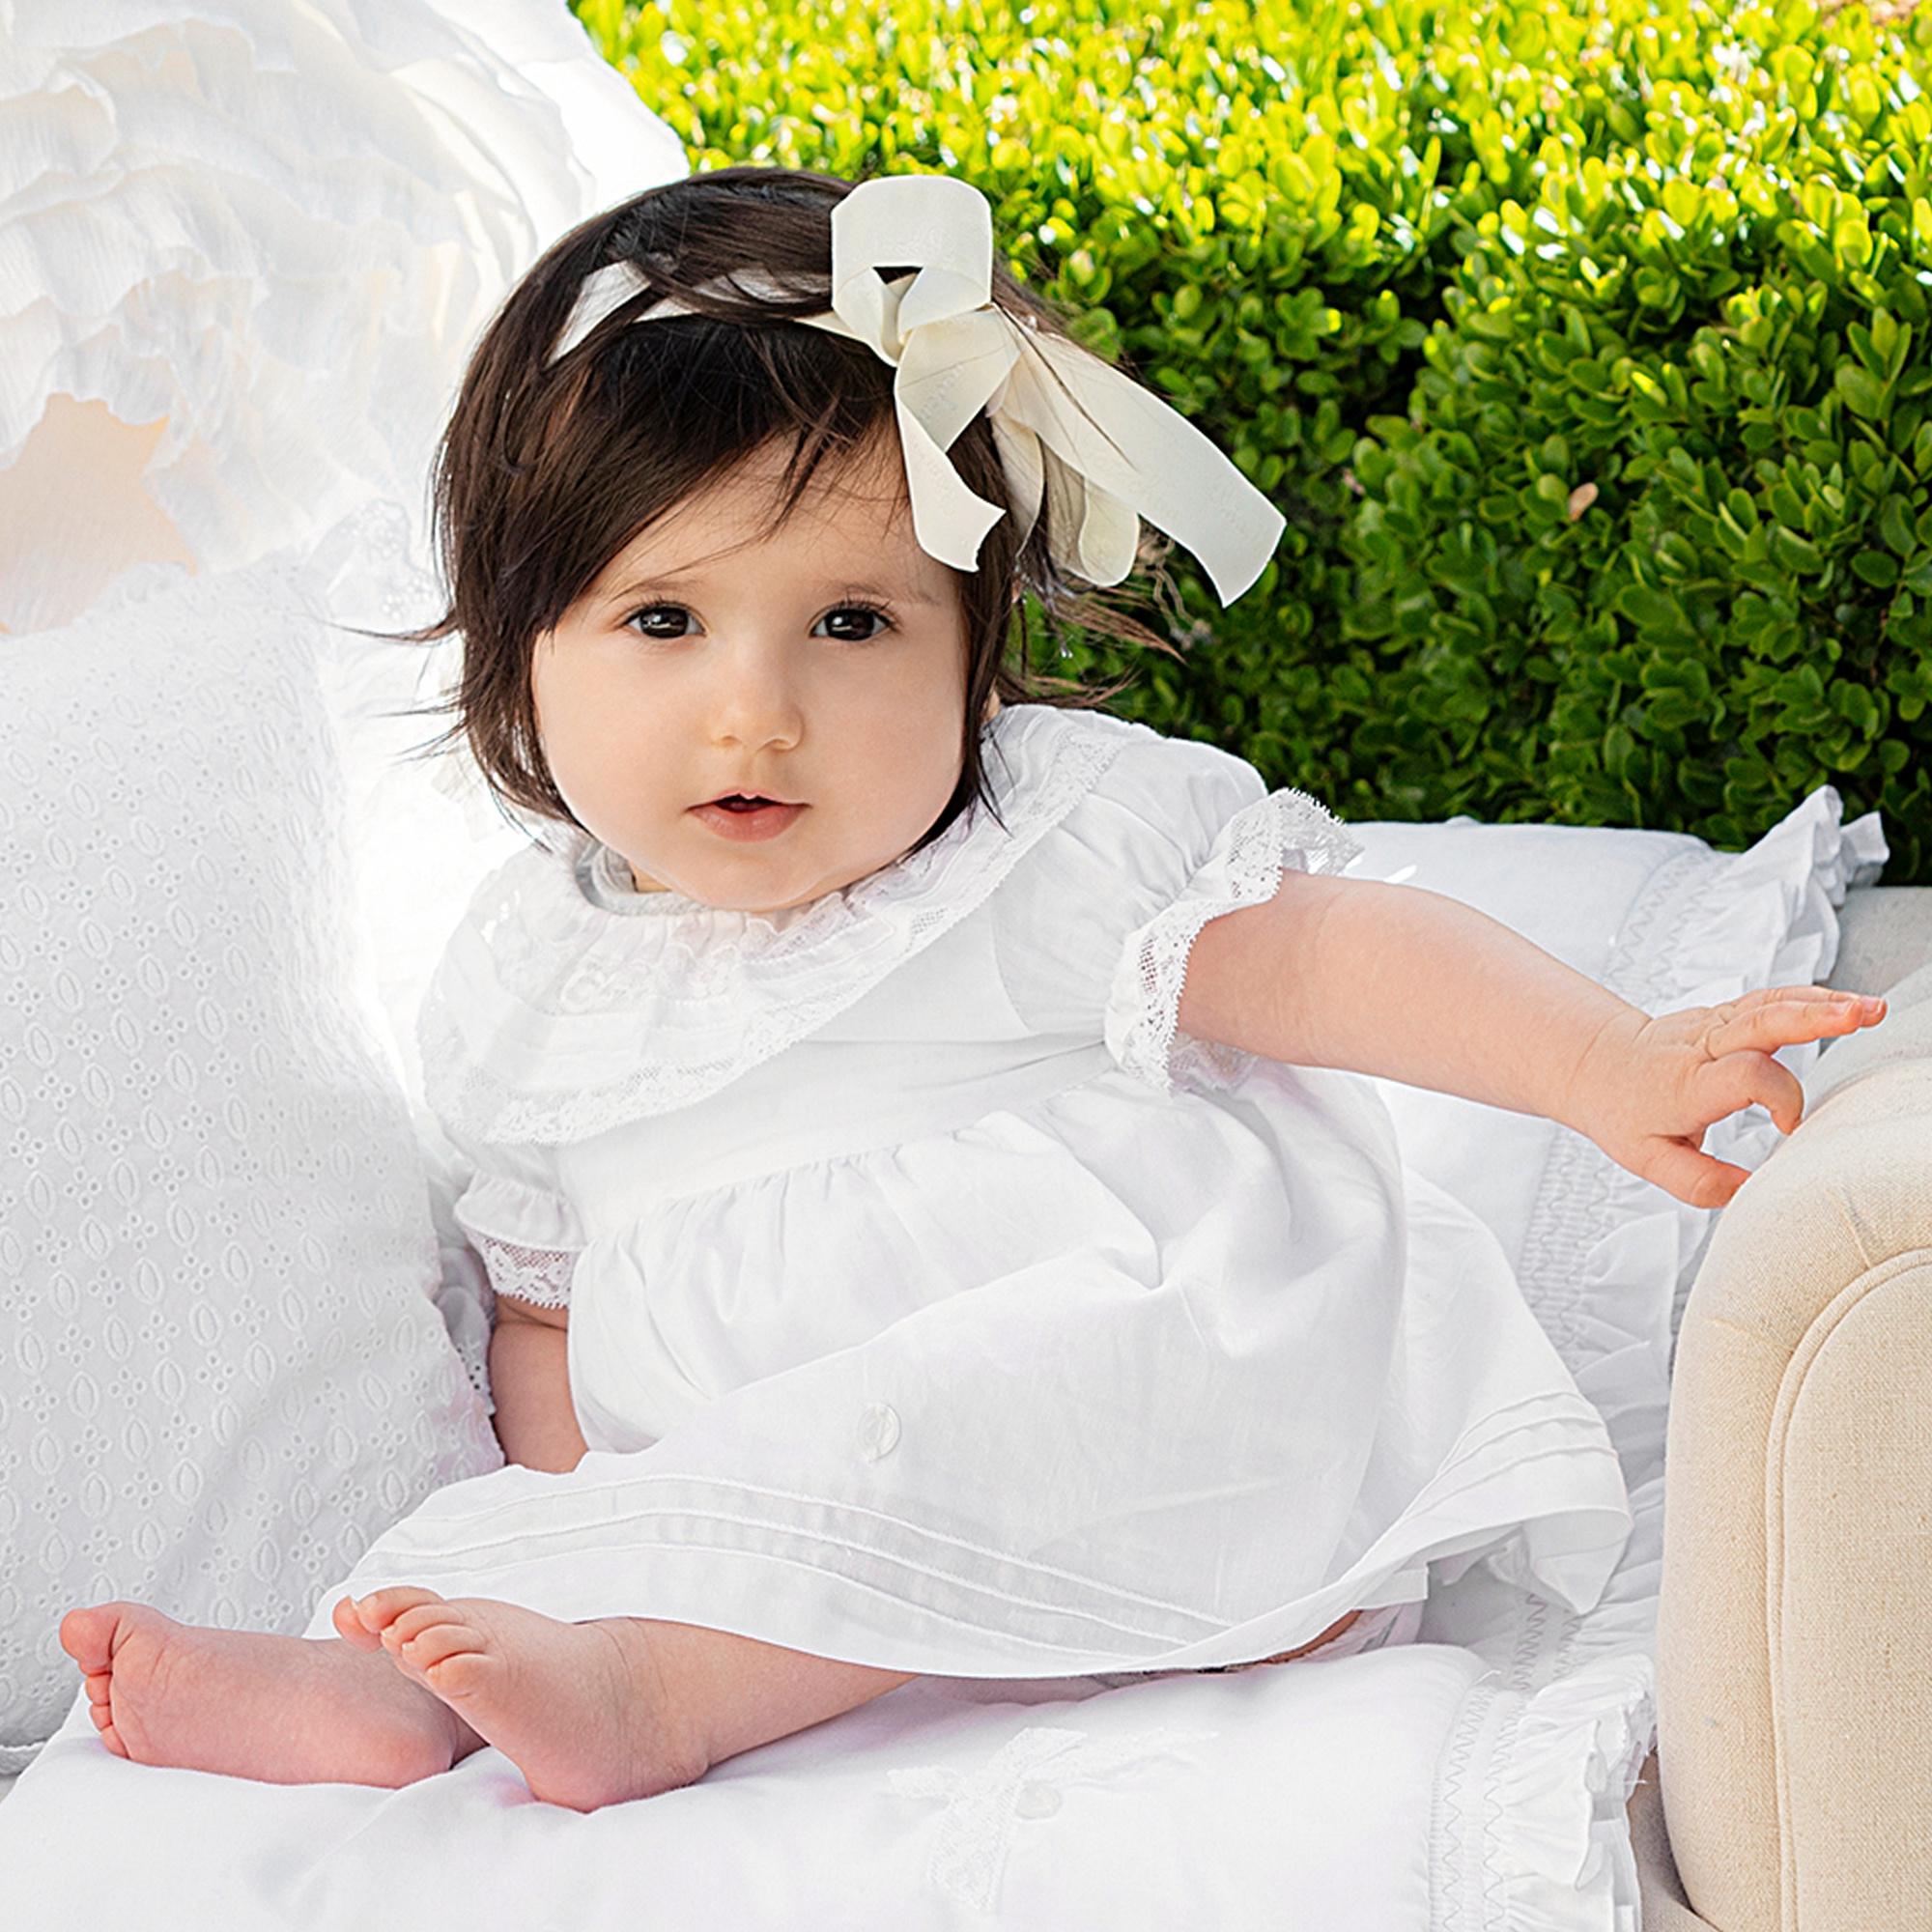 PATACHOU | Wit jurkje met prachtige kanten kraag-5